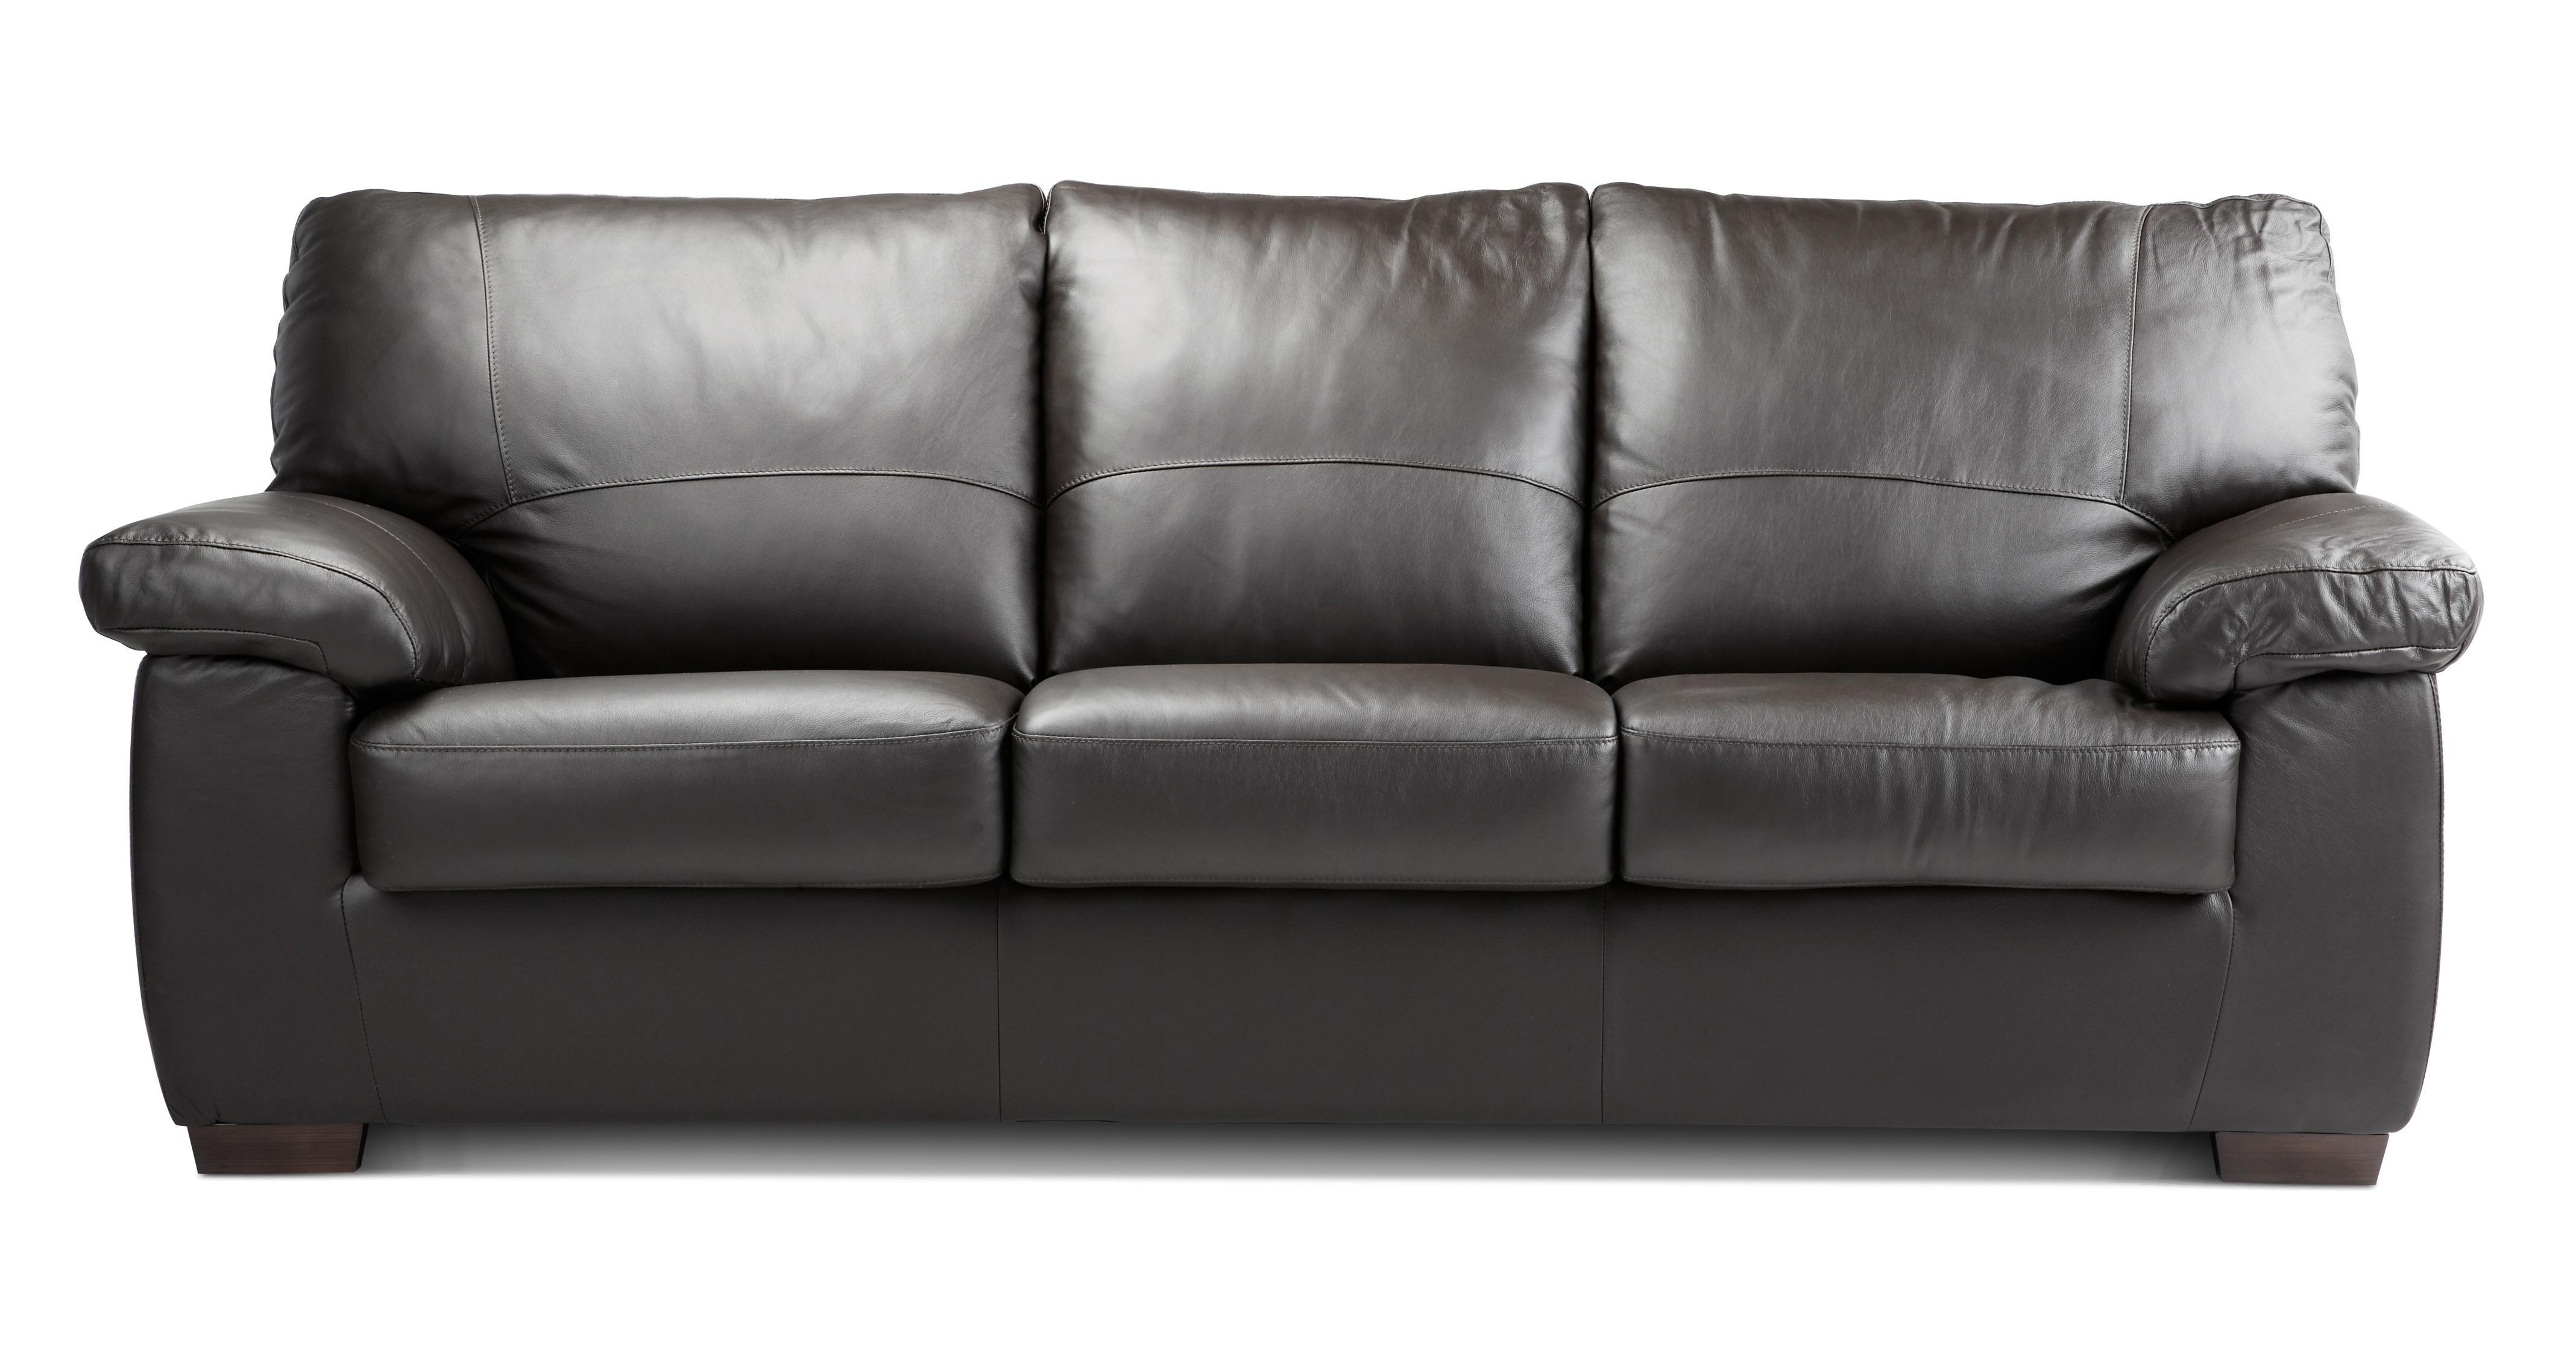 Terrific Pavilion 3 Seater Sofa Bed Essential Dfs Spain Lamtechconsult Wood Chair Design Ideas Lamtechconsultcom